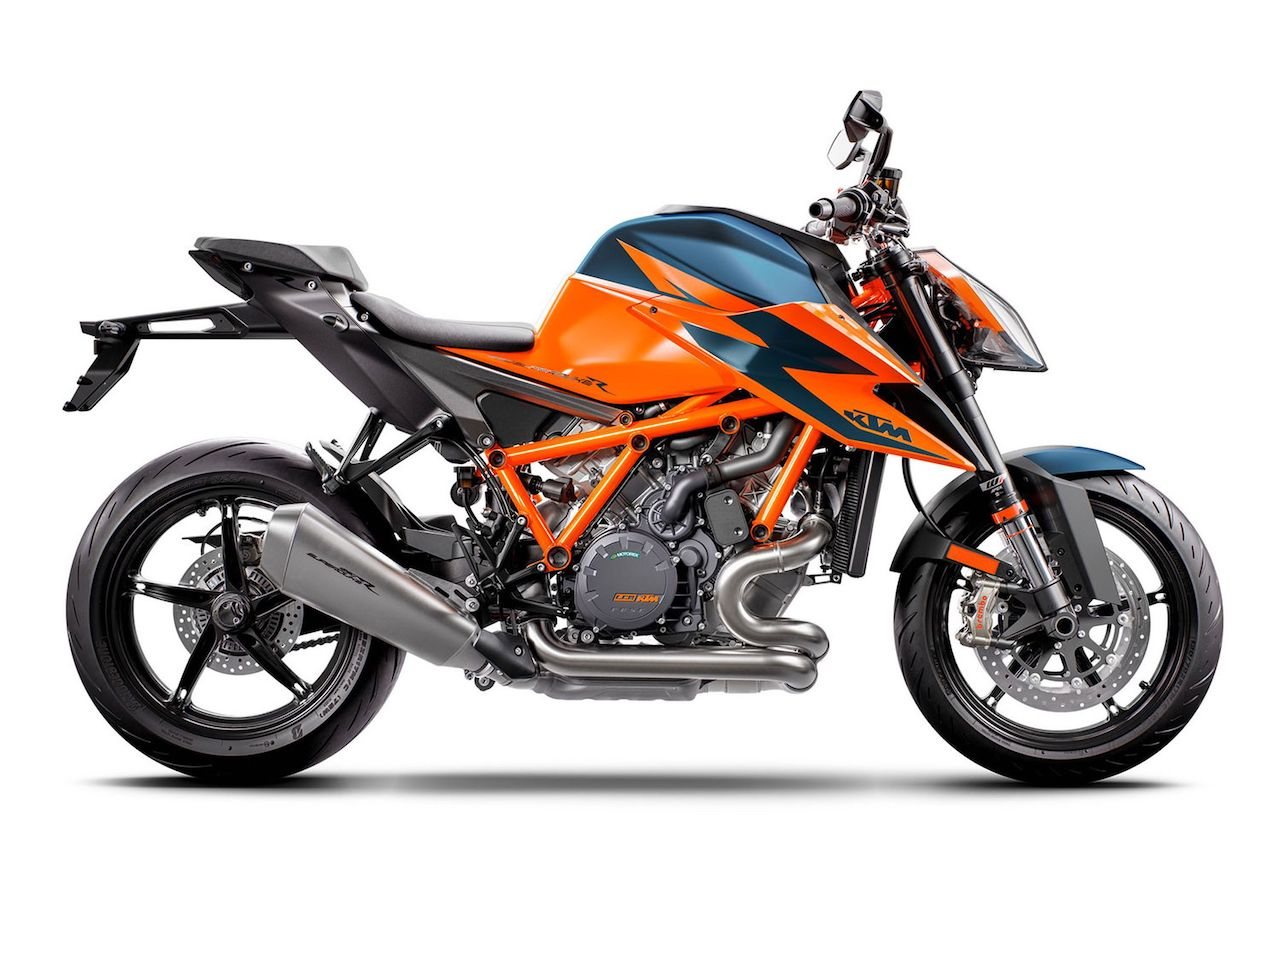 2020-KTM-1290-Super-Duke-R-naked-cycleworld-revista-moto-adventure